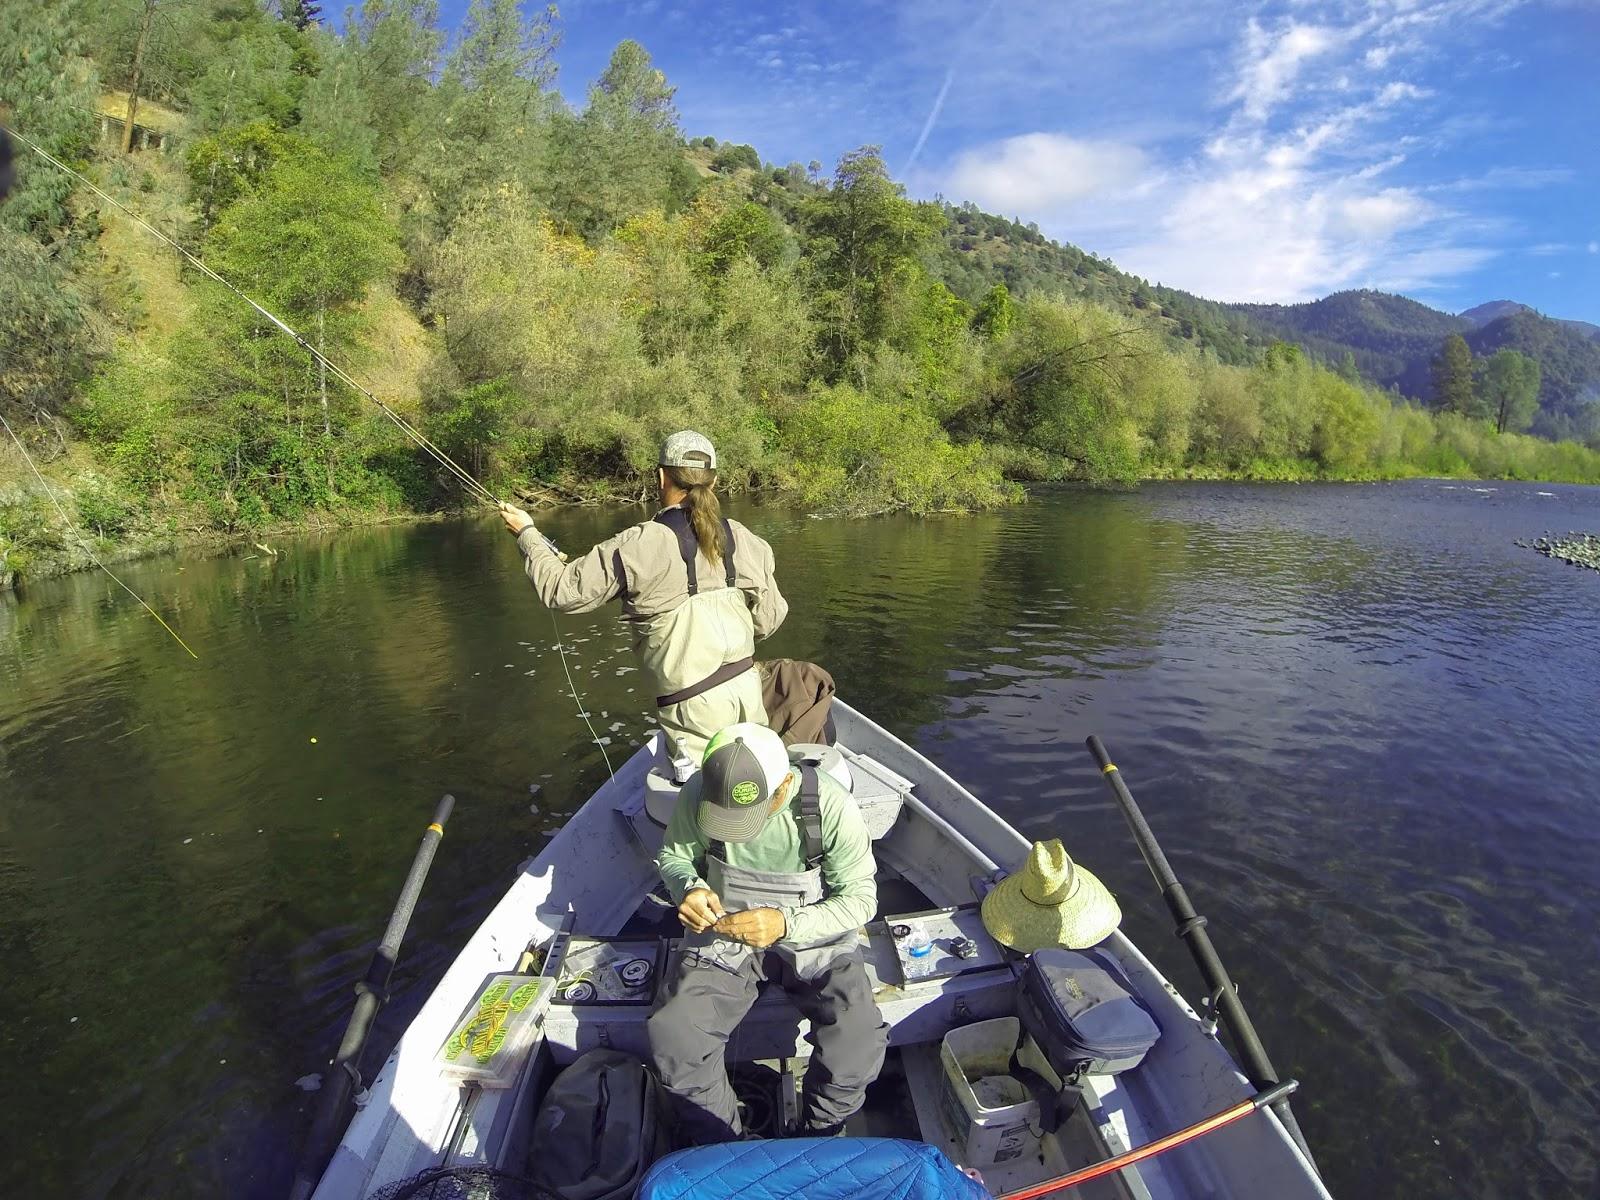 Jon baiocchi fly fishing news trinity river fishing for Jrs upper red lake fishing report